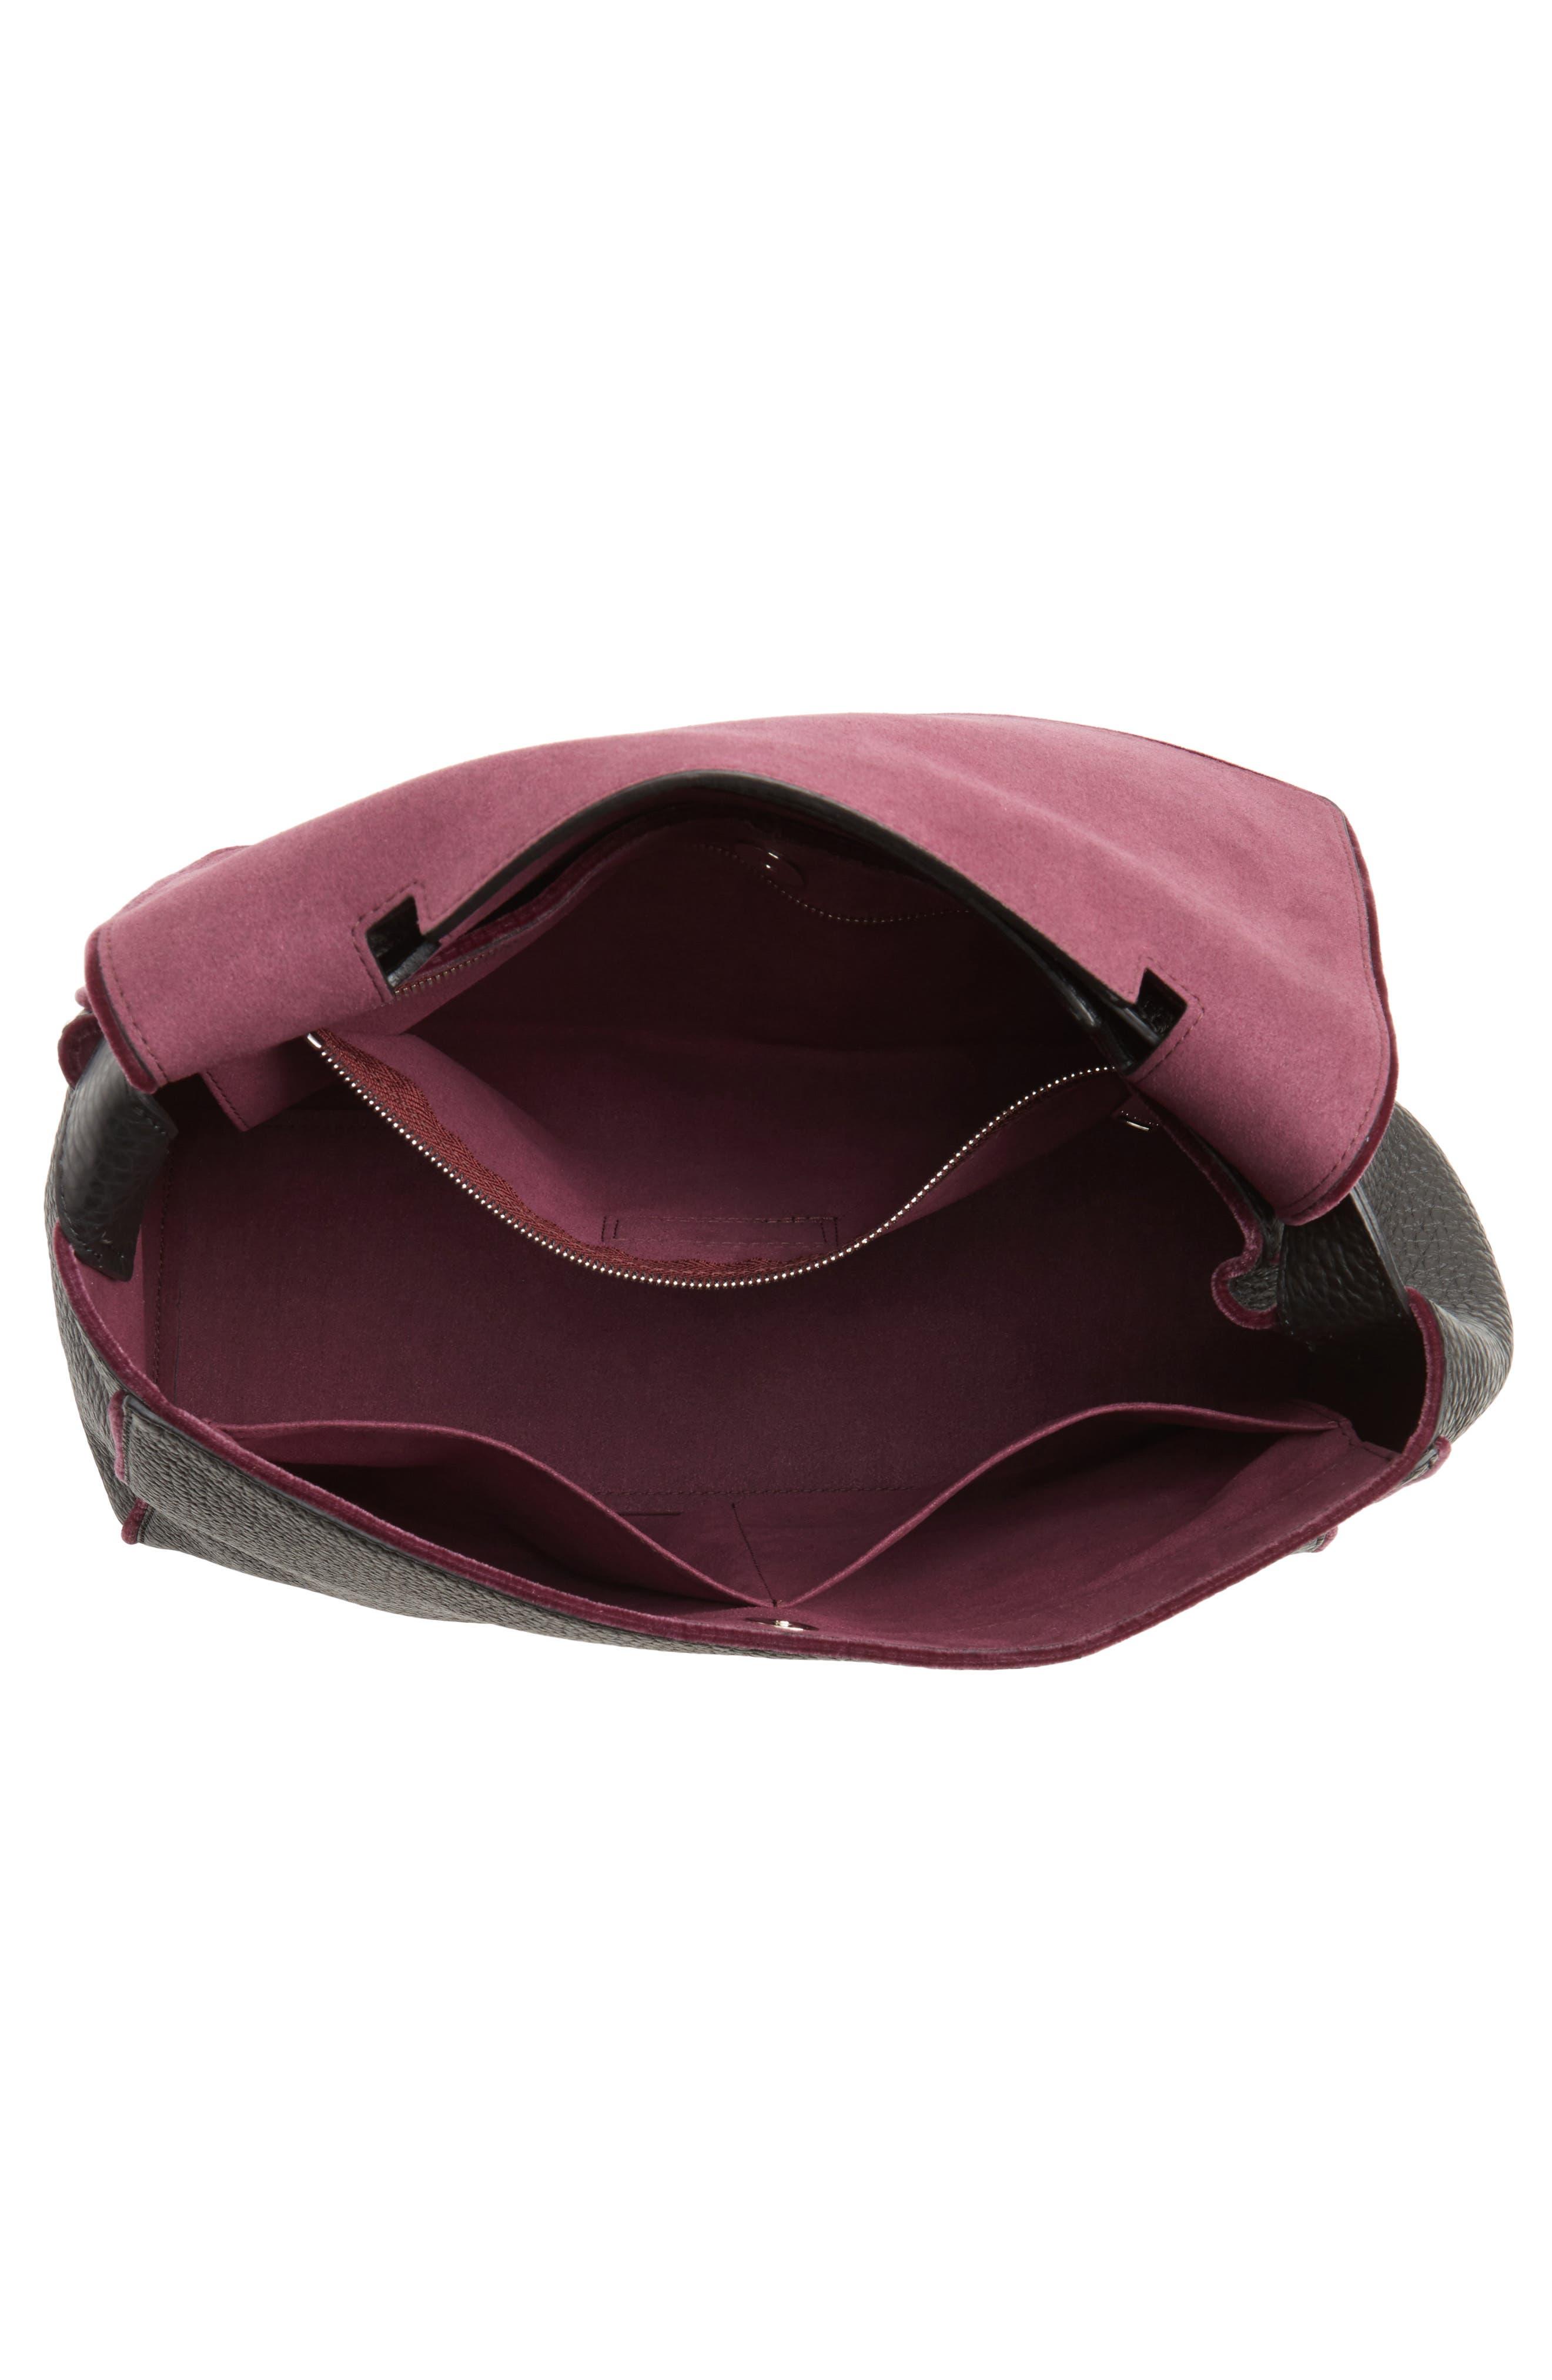 Alternate Image 3  - Orciani Large Sveva Soft Leather Top Handle Satchel with Genuine Fur Bag Charm